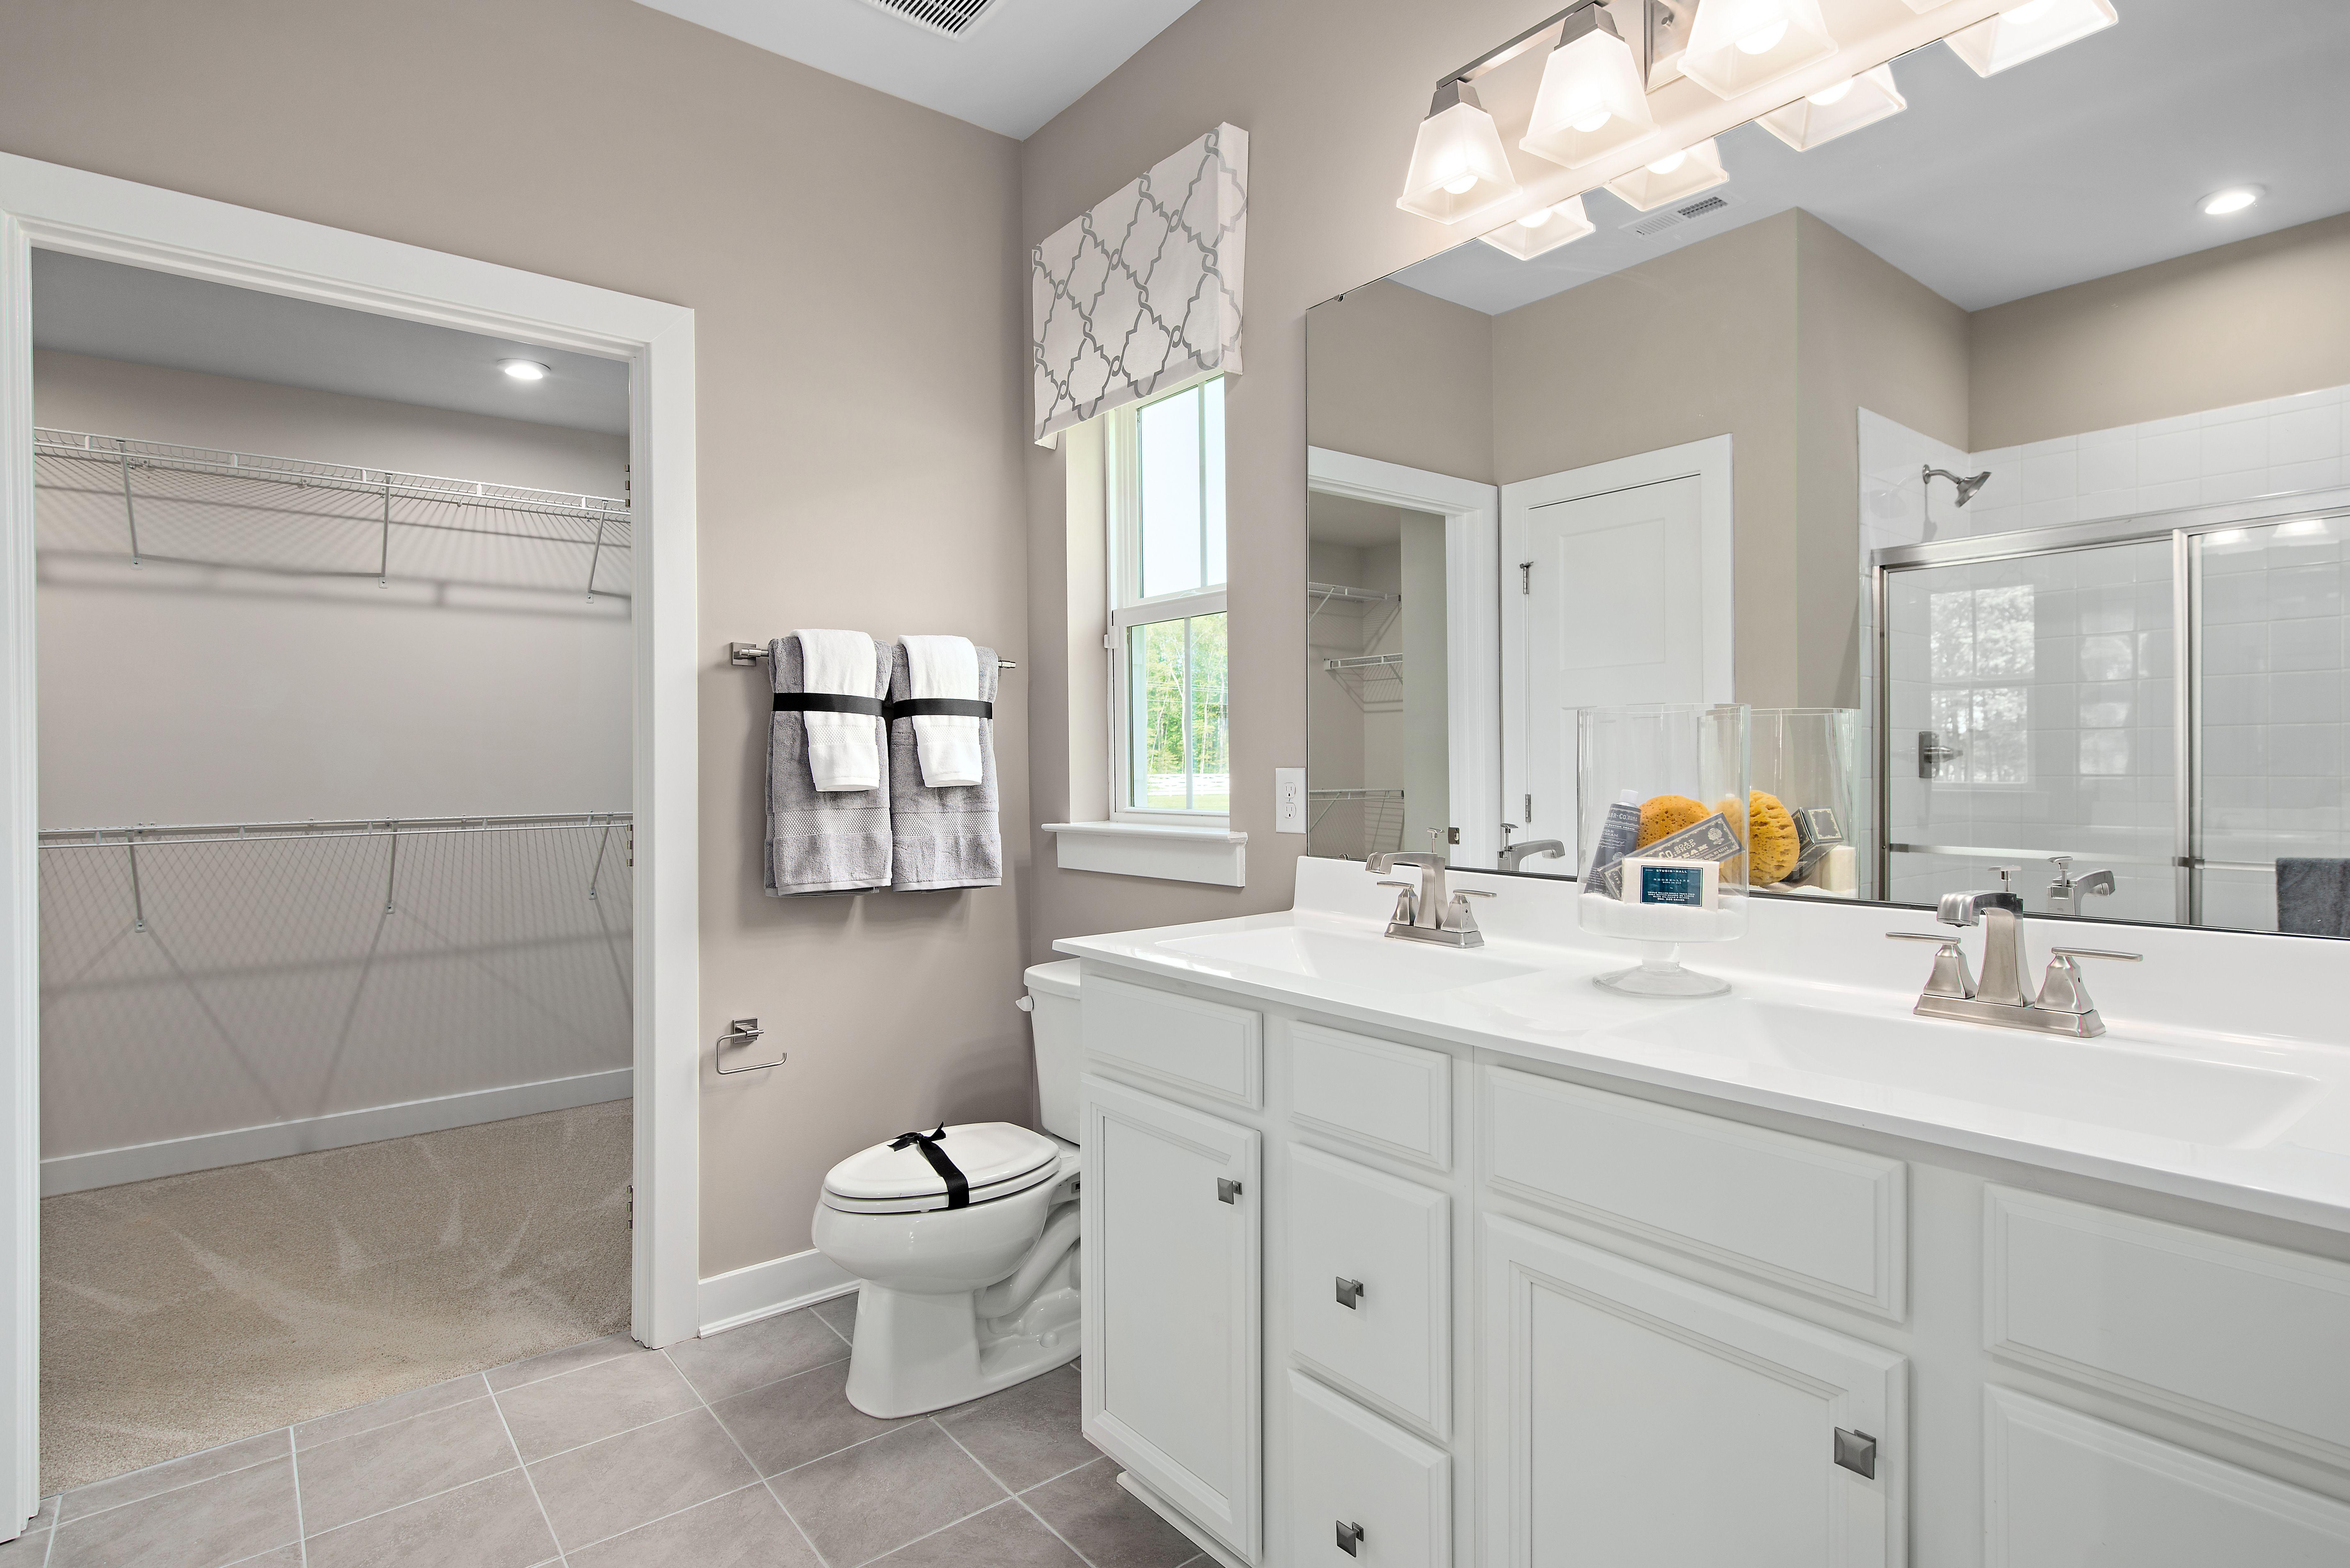 Bathroom featured in the Bramante 2 Story By Ryan Homes in Philadelphia, NJ